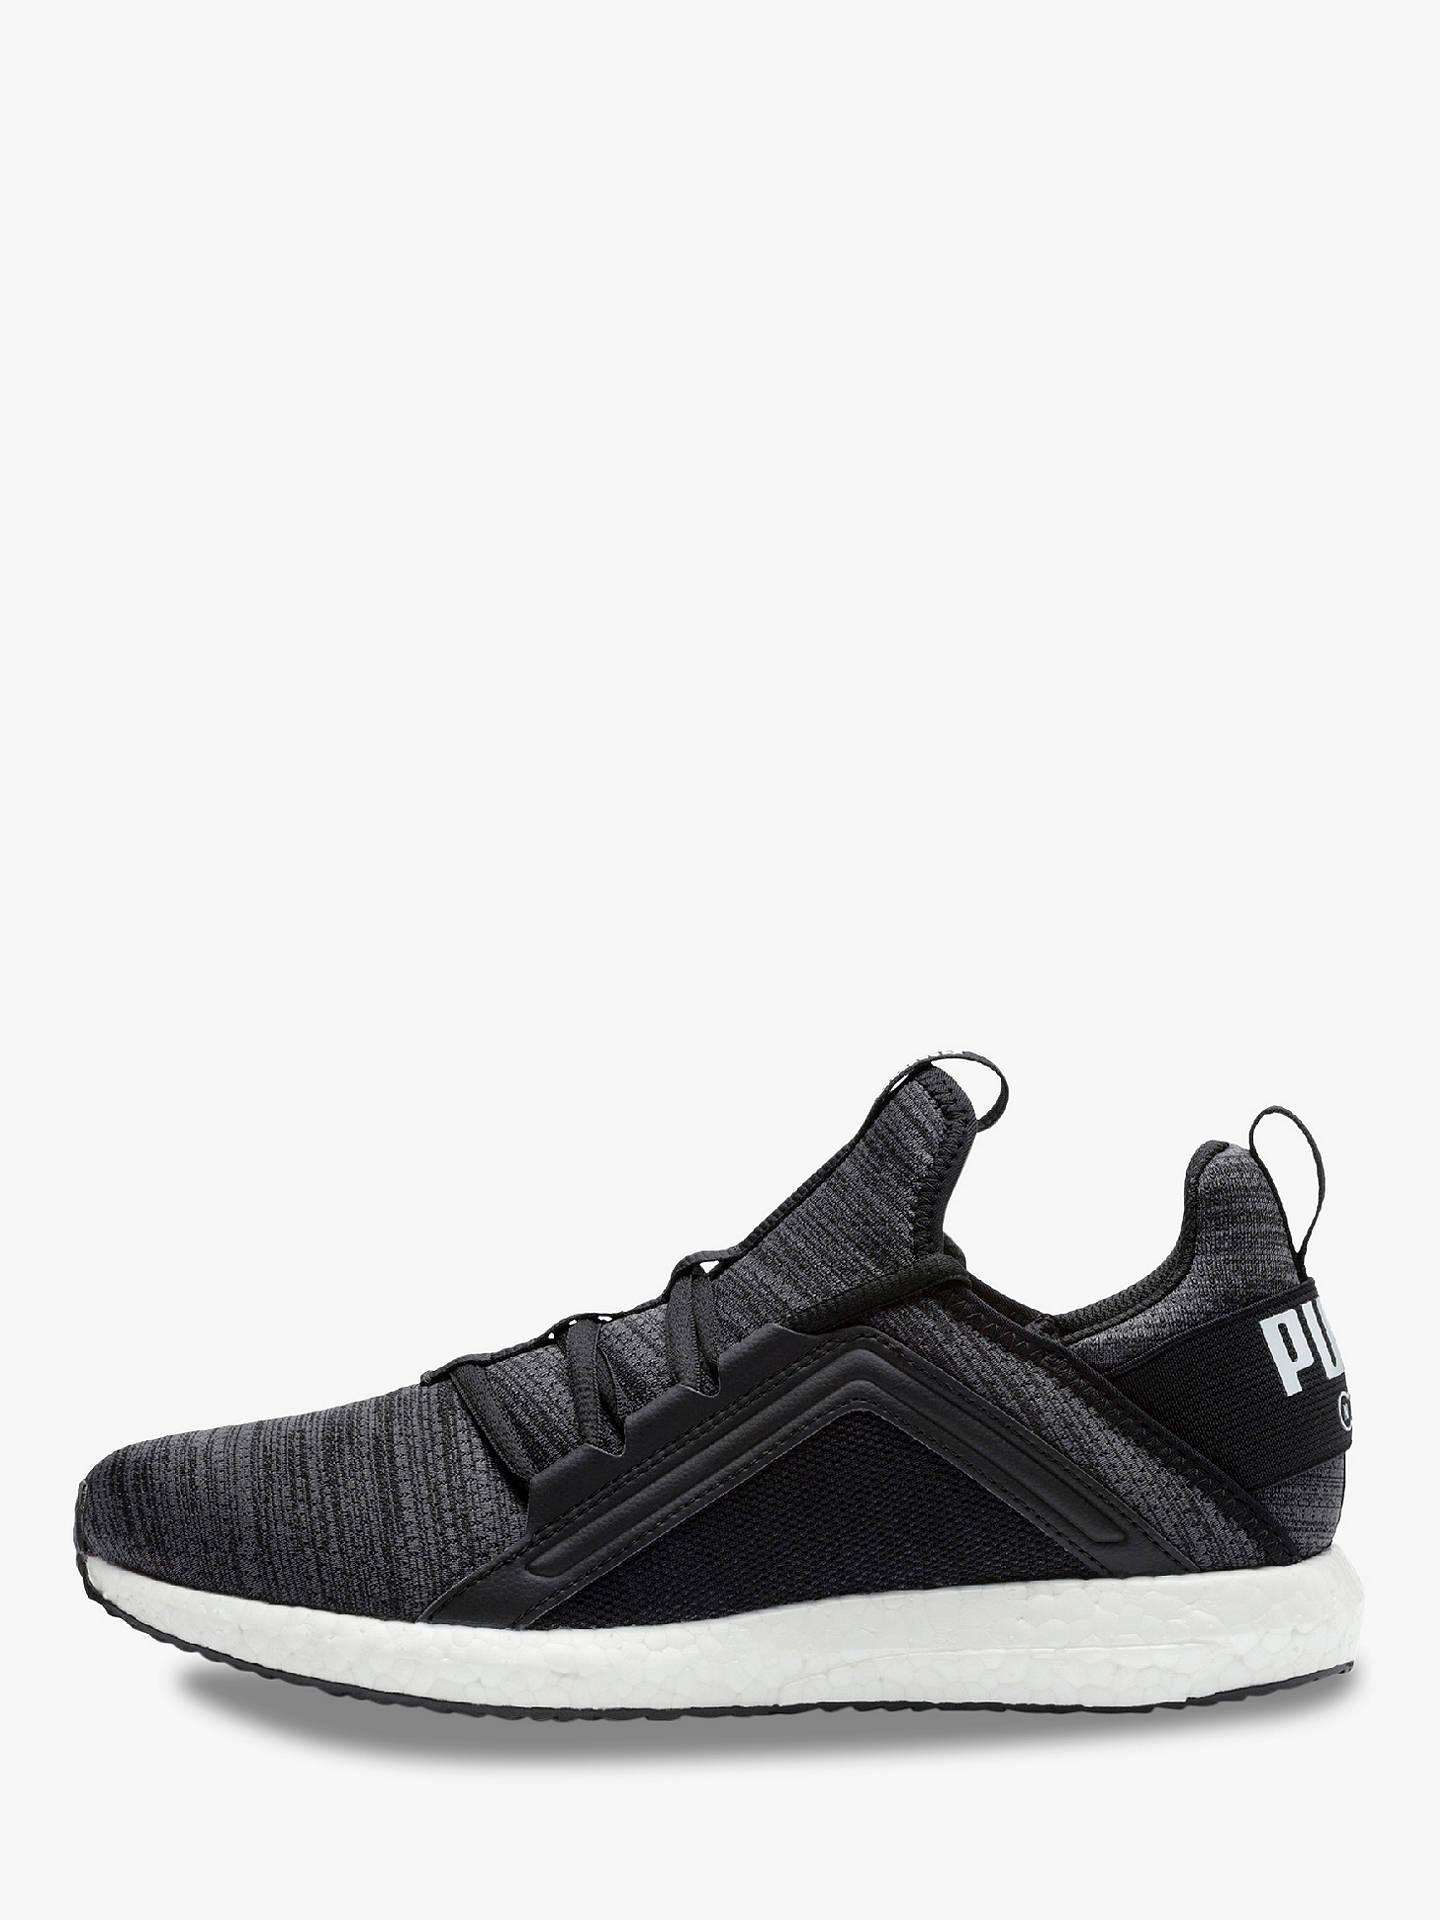 c40b59daf944 ... Buy PUMA NRGY Neko Knit Women s Running Shoes